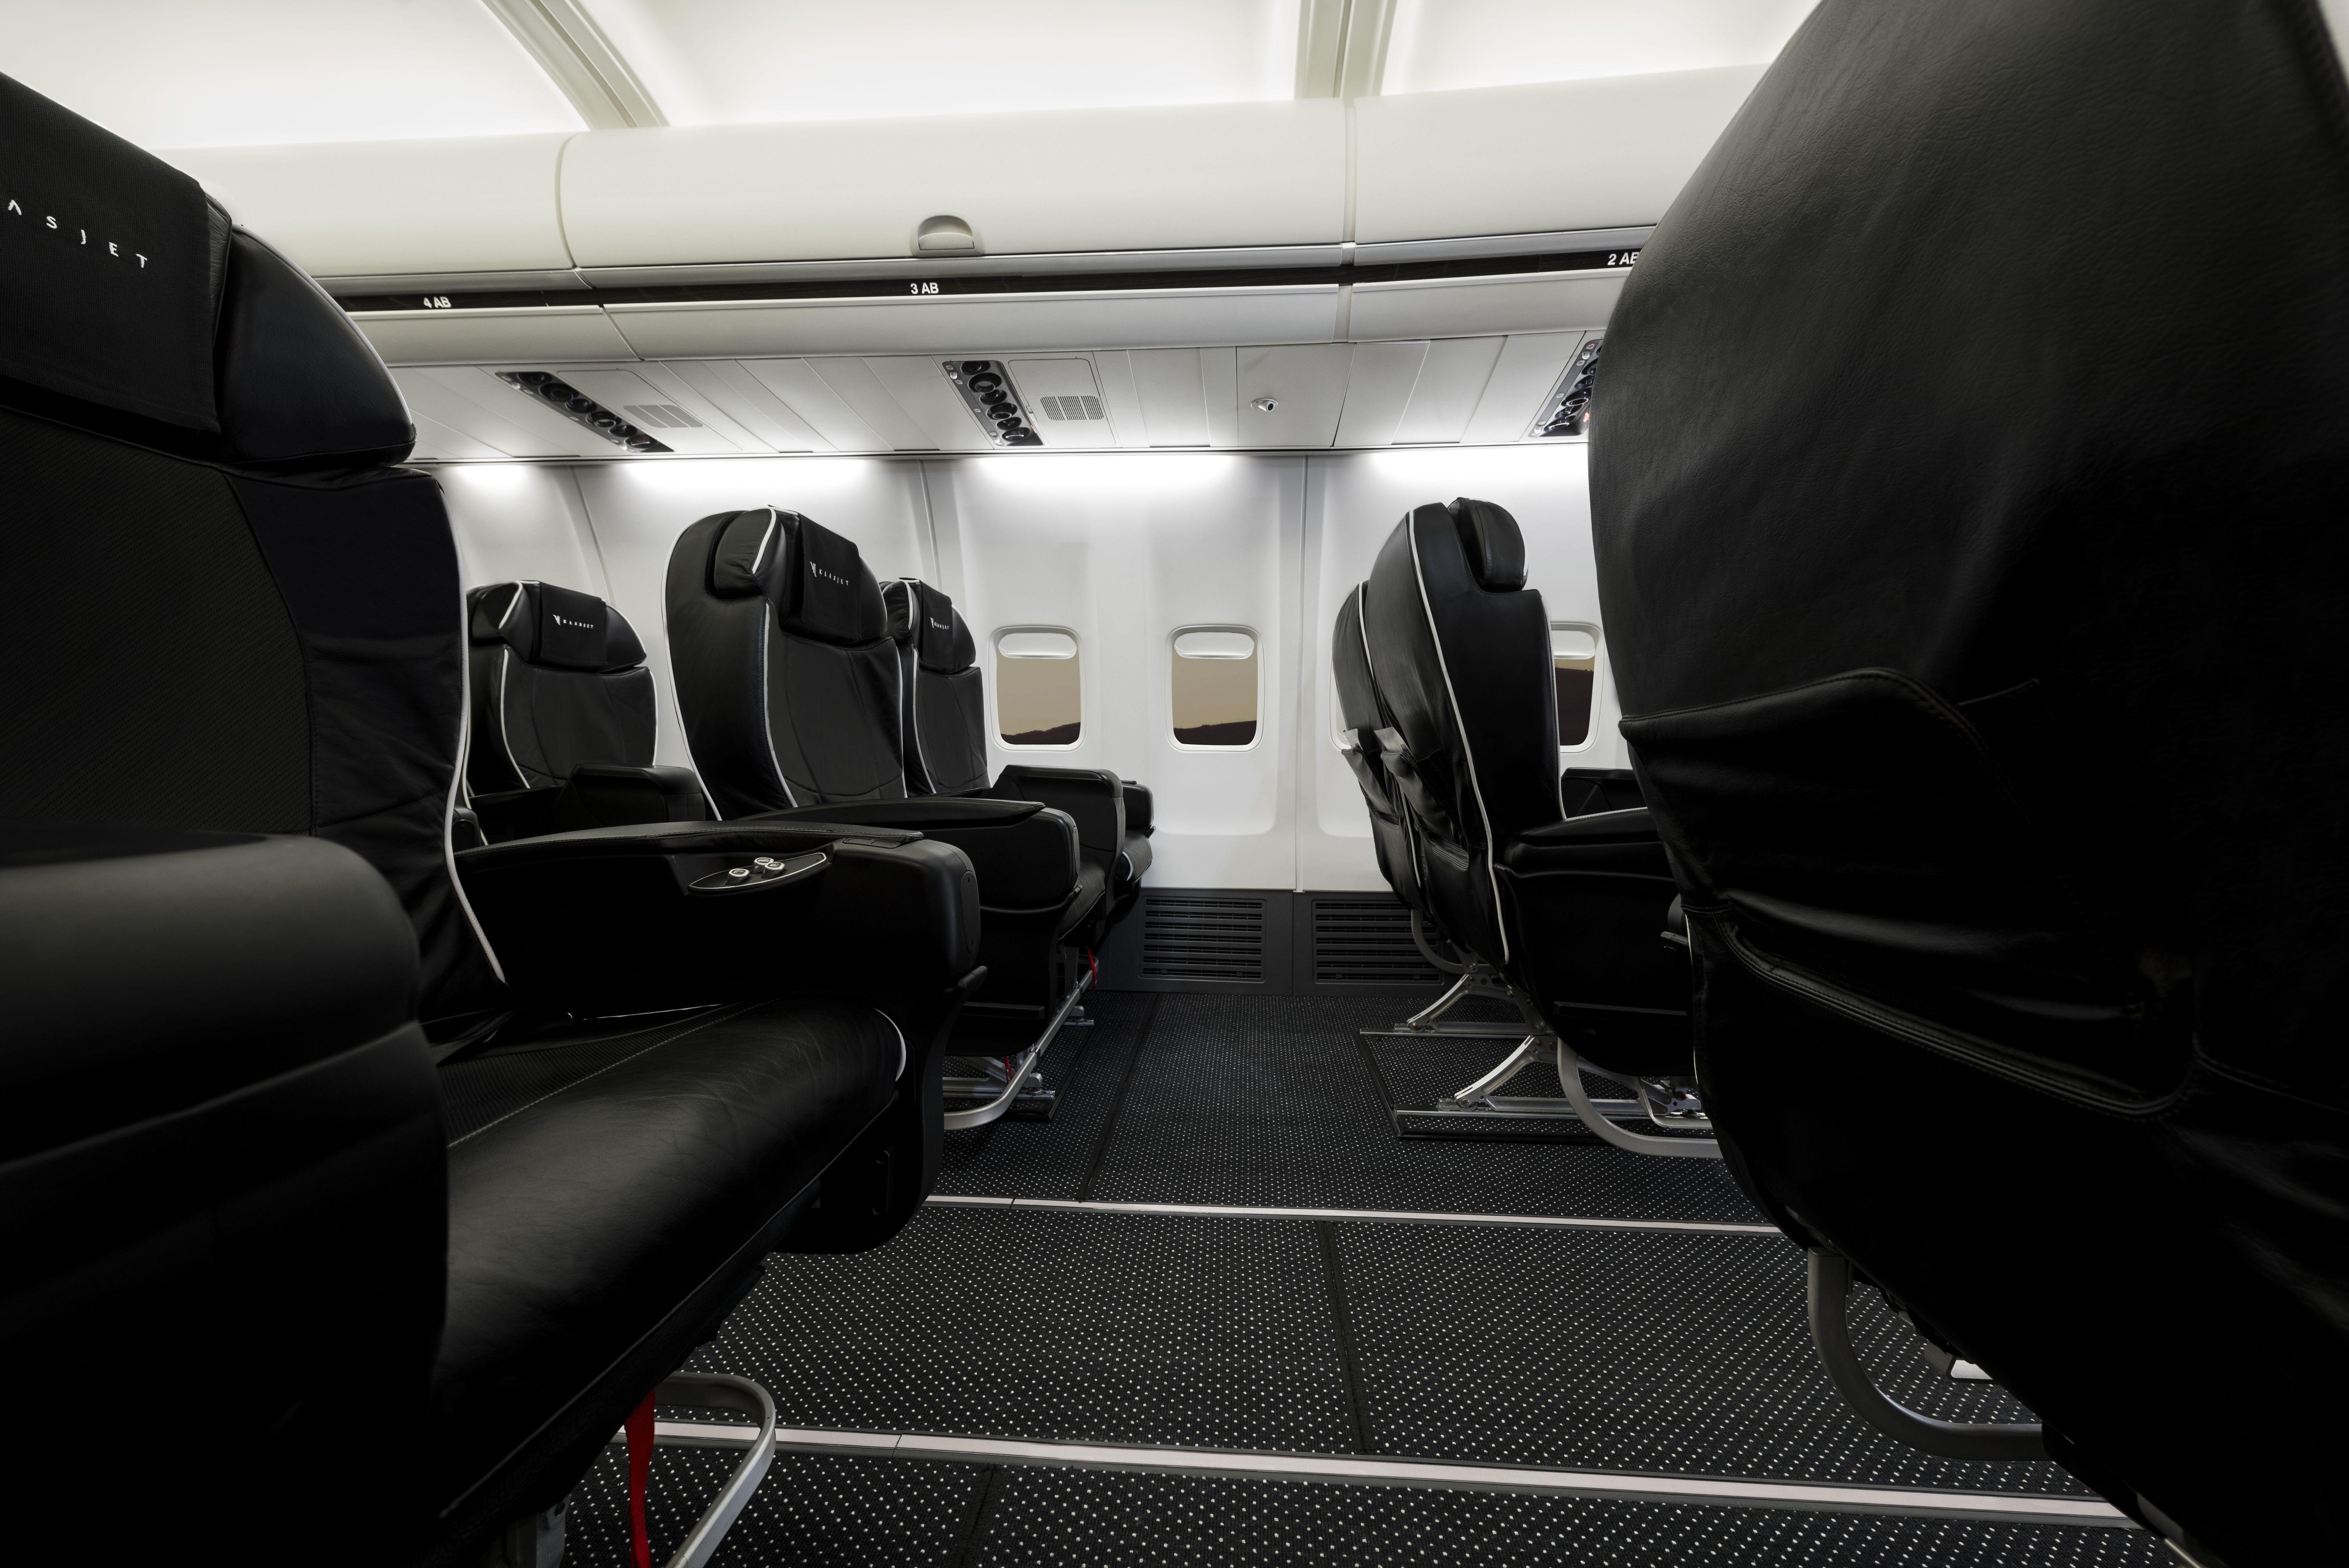 Klasjet Boeing 737 Corporate Jet Vip Private Jet Boeing 737 Boeing